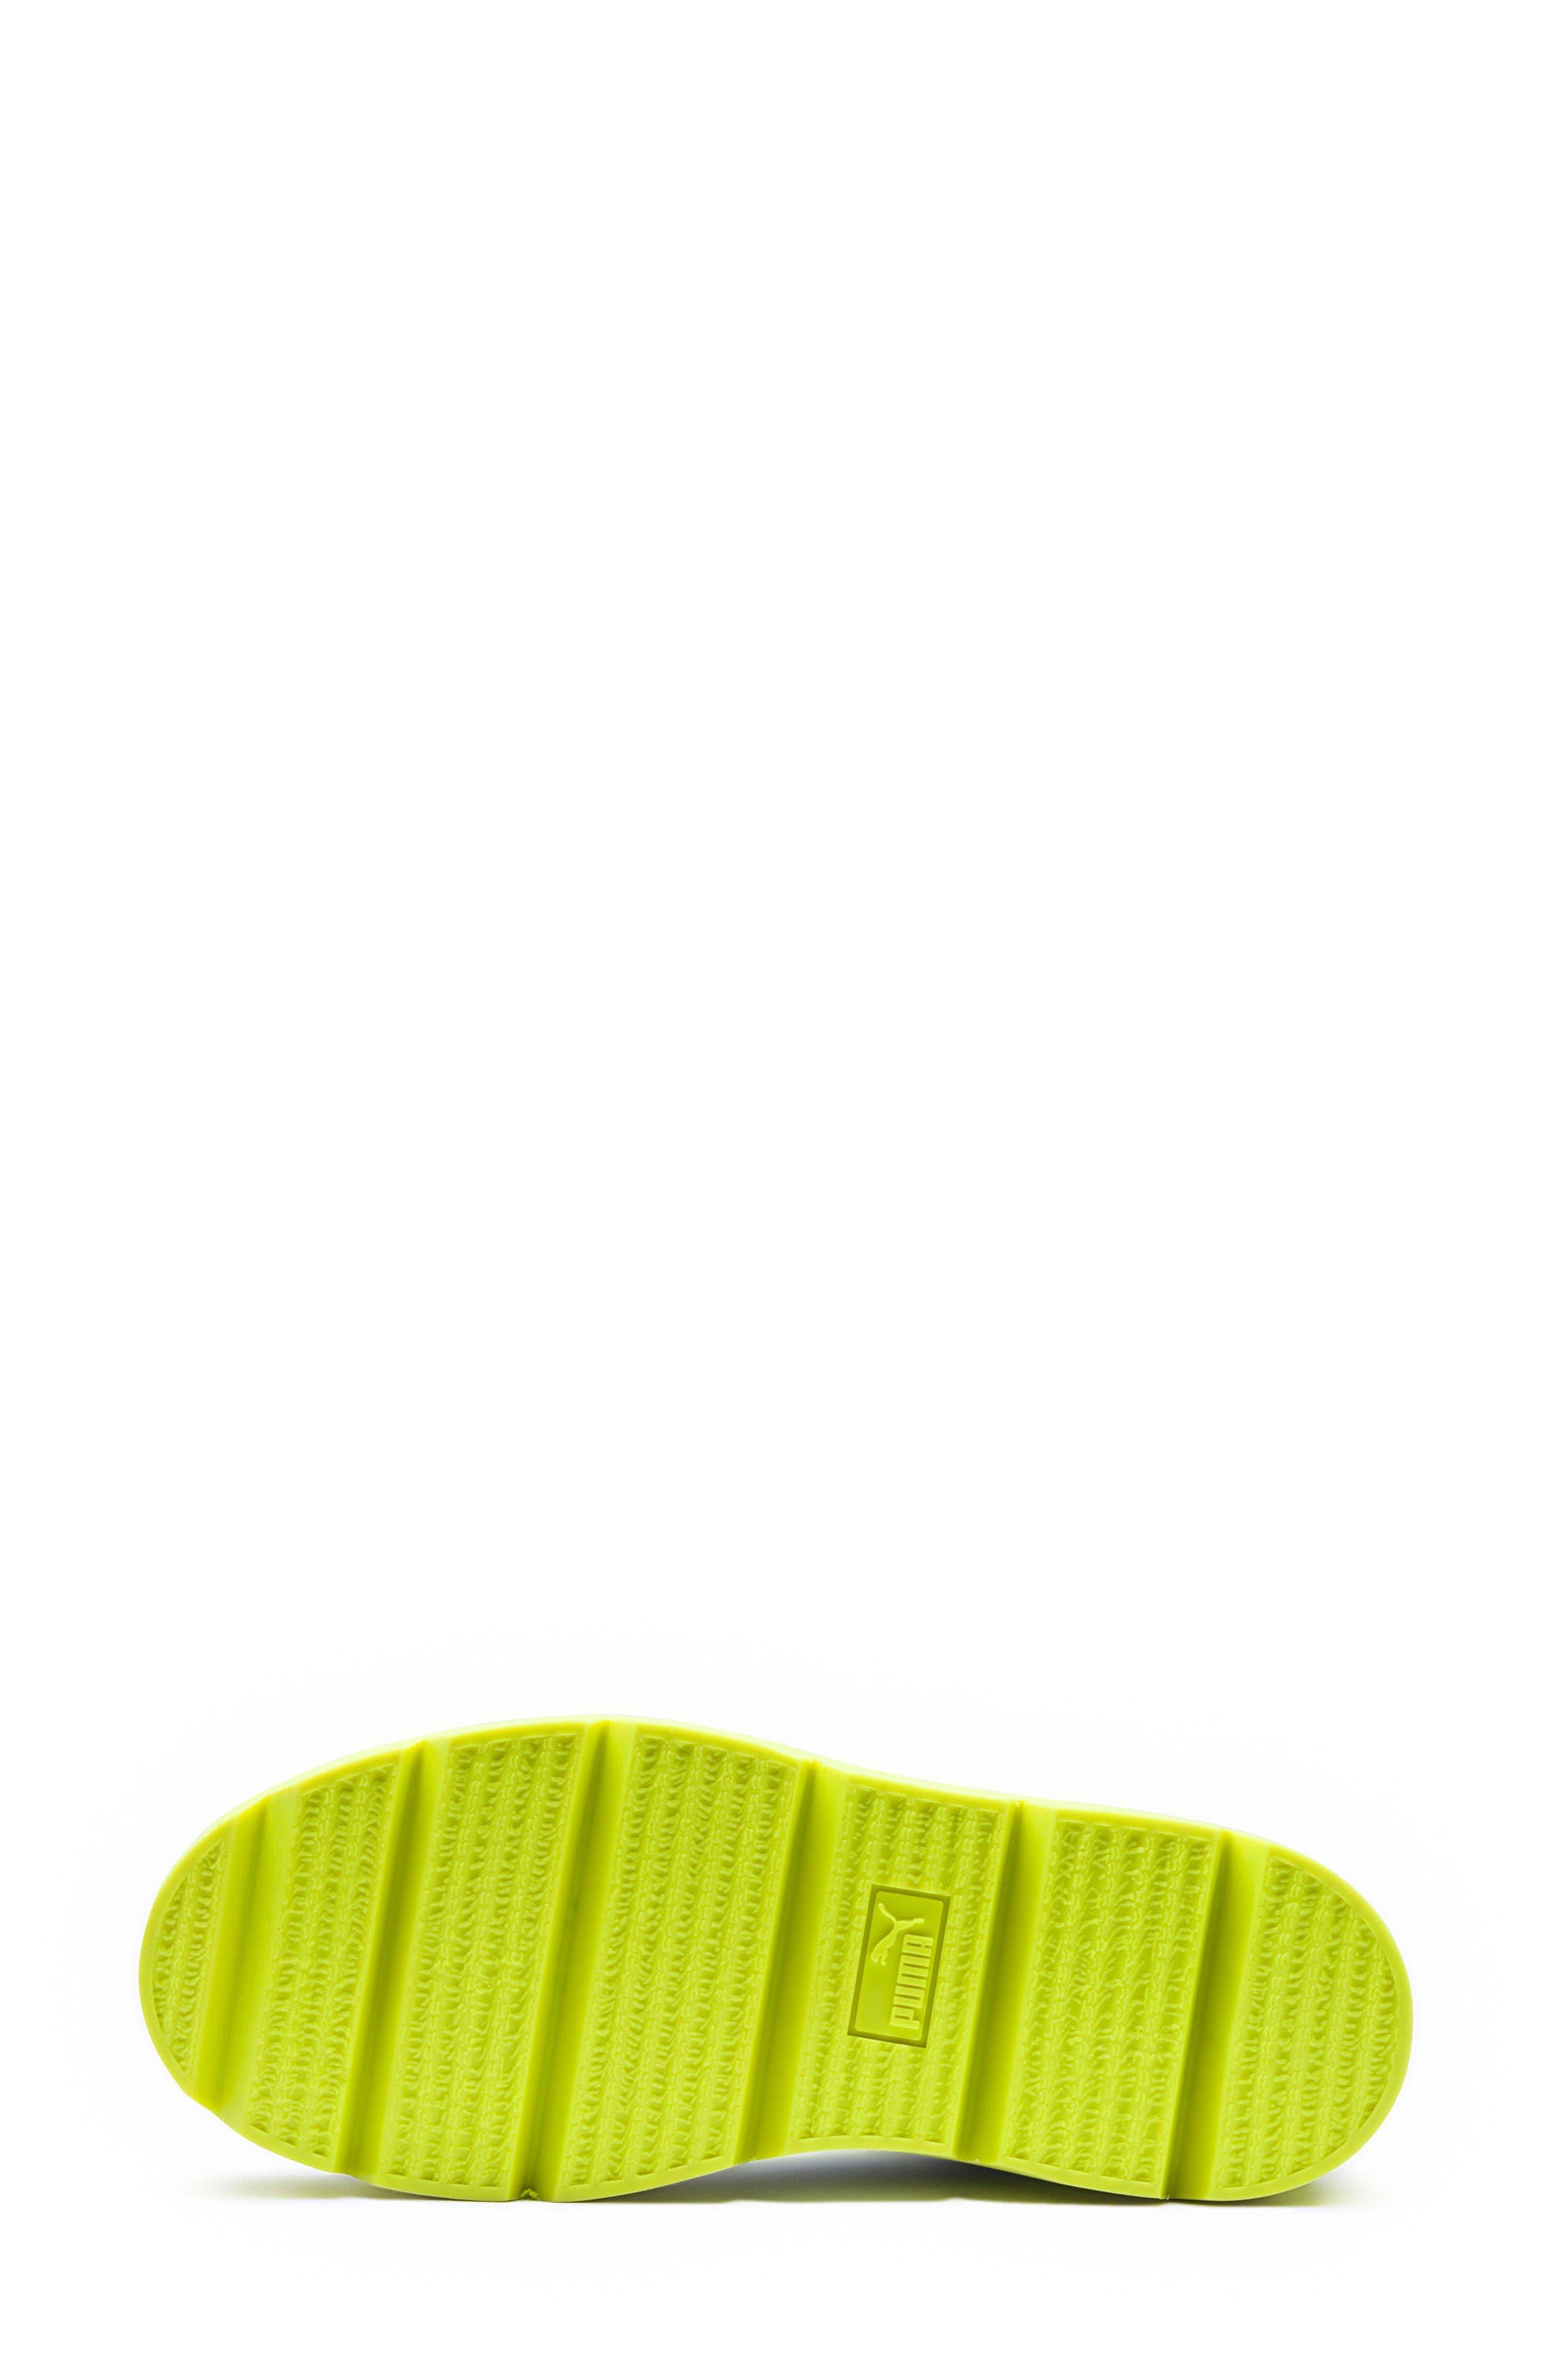 FENTY PUMA by Rihanna Chelsea Boot Creeper Sneaker,                             Alternate thumbnail 12, color,